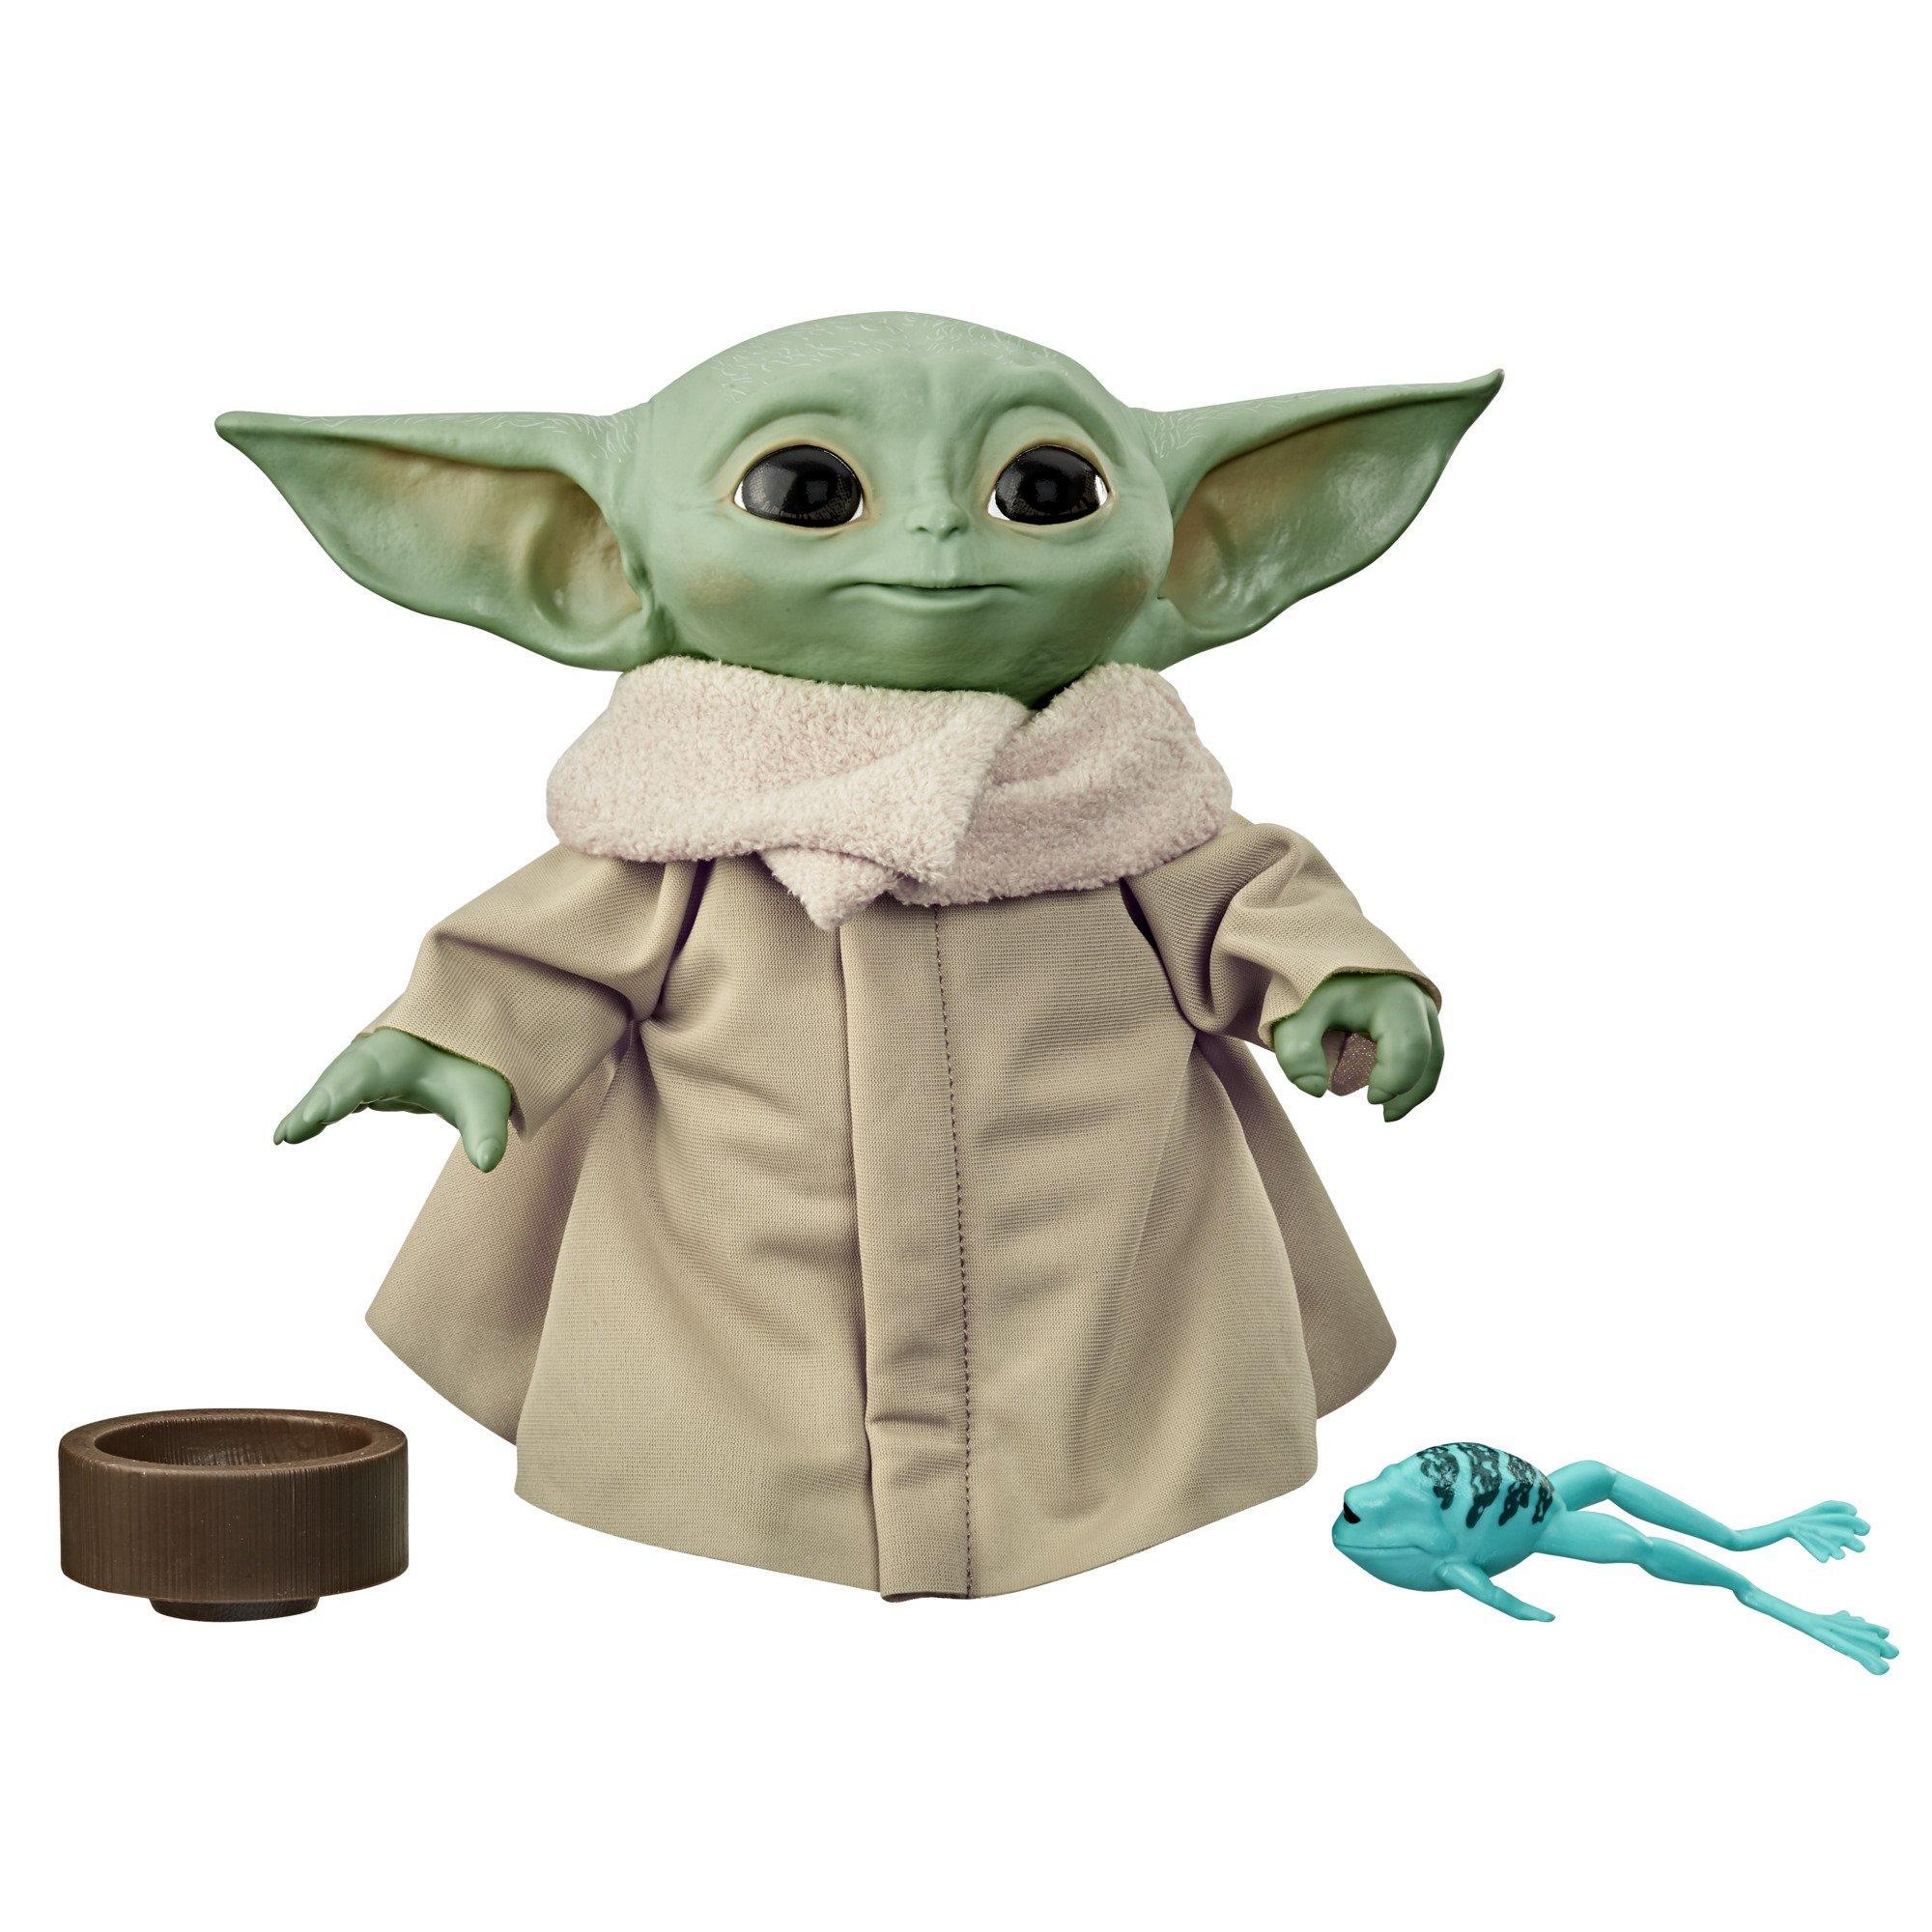 Baby Yoda Mandalorian Star Wars Inspired Toddler ts